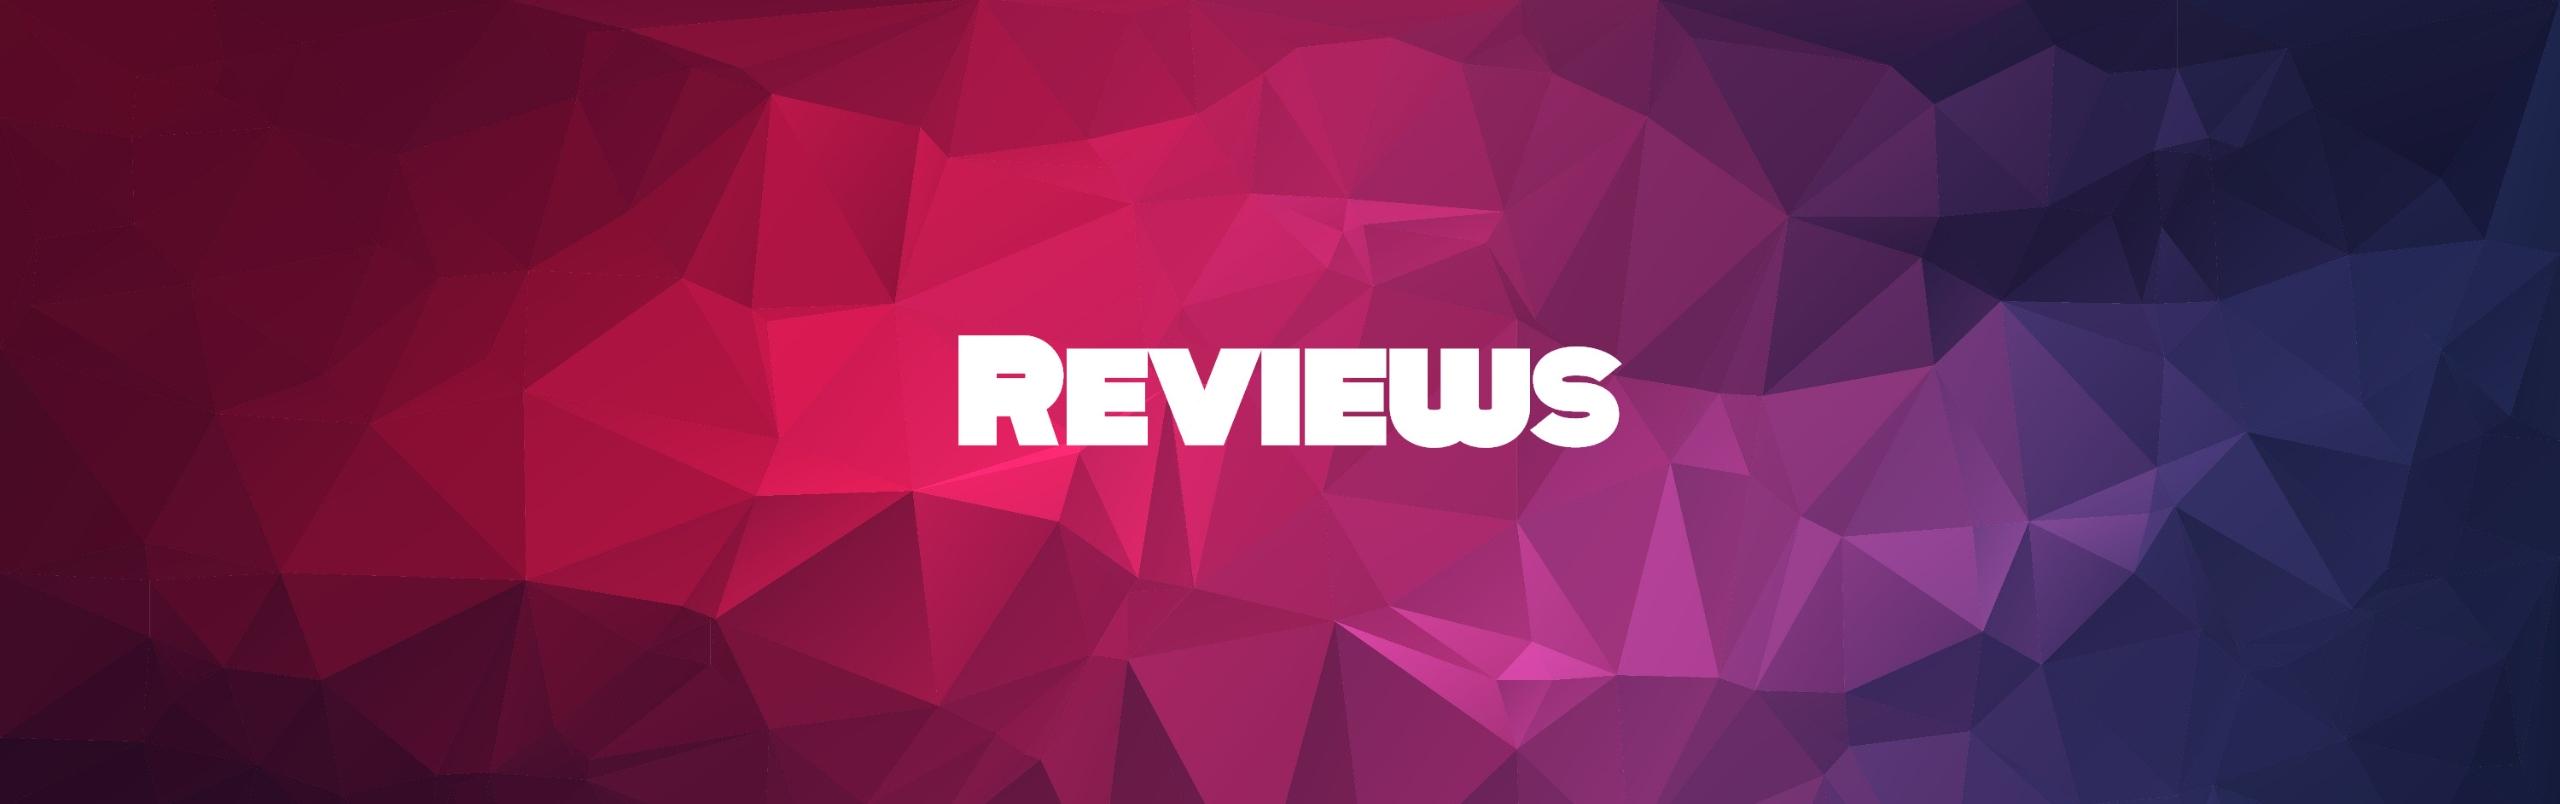 https://tutebianche.org là website chuyên review  (@tutebianche) Cover Image